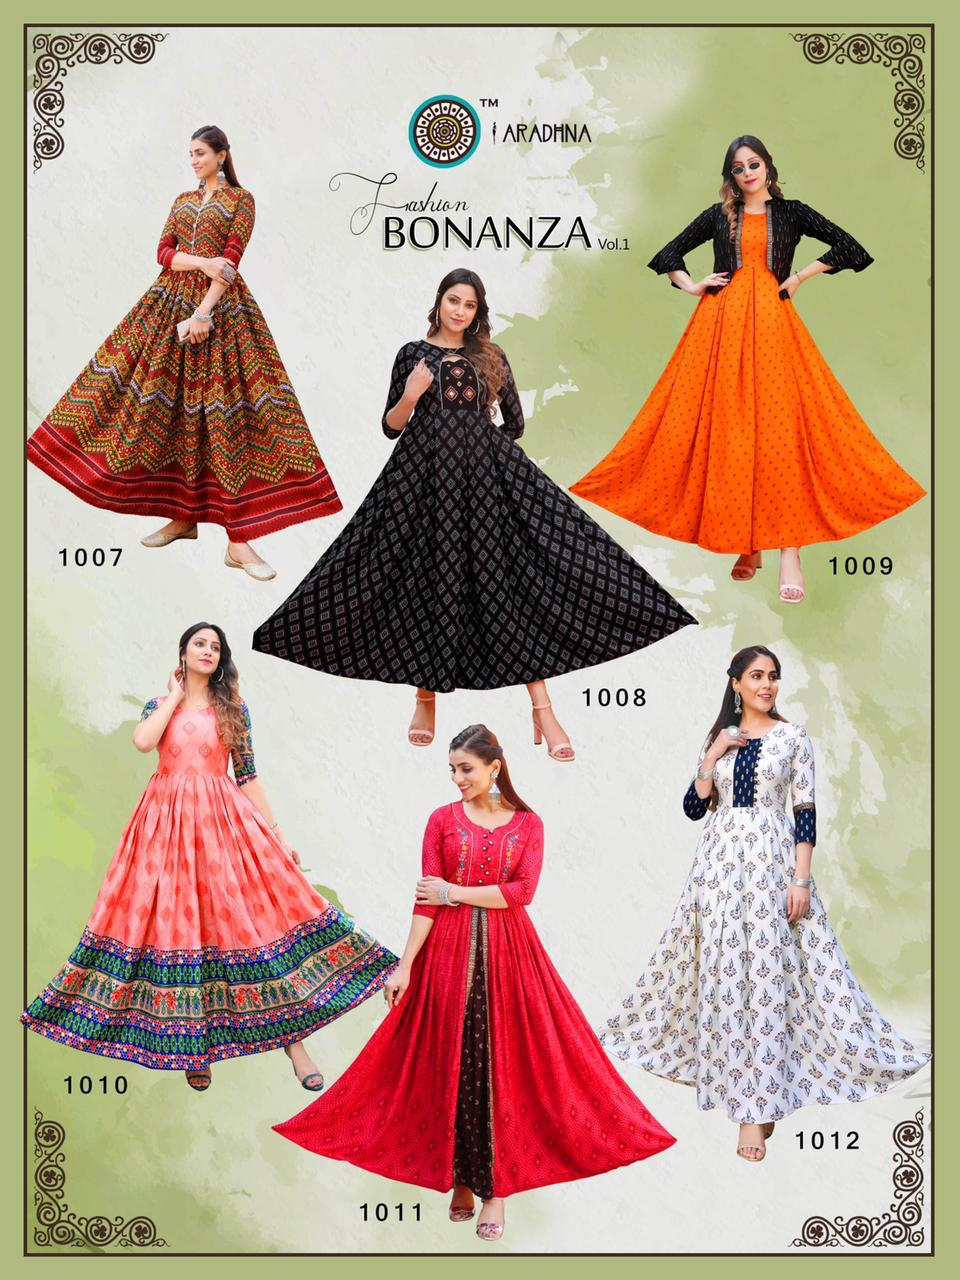 Aradhna Fashion Bonanza Vol 1 Kurti Wholesale Catalog 12 Pcs 20 - Aradhna Fashion Bonanza Vol 1 Kurti Wholesale Catalog 12 Pcs